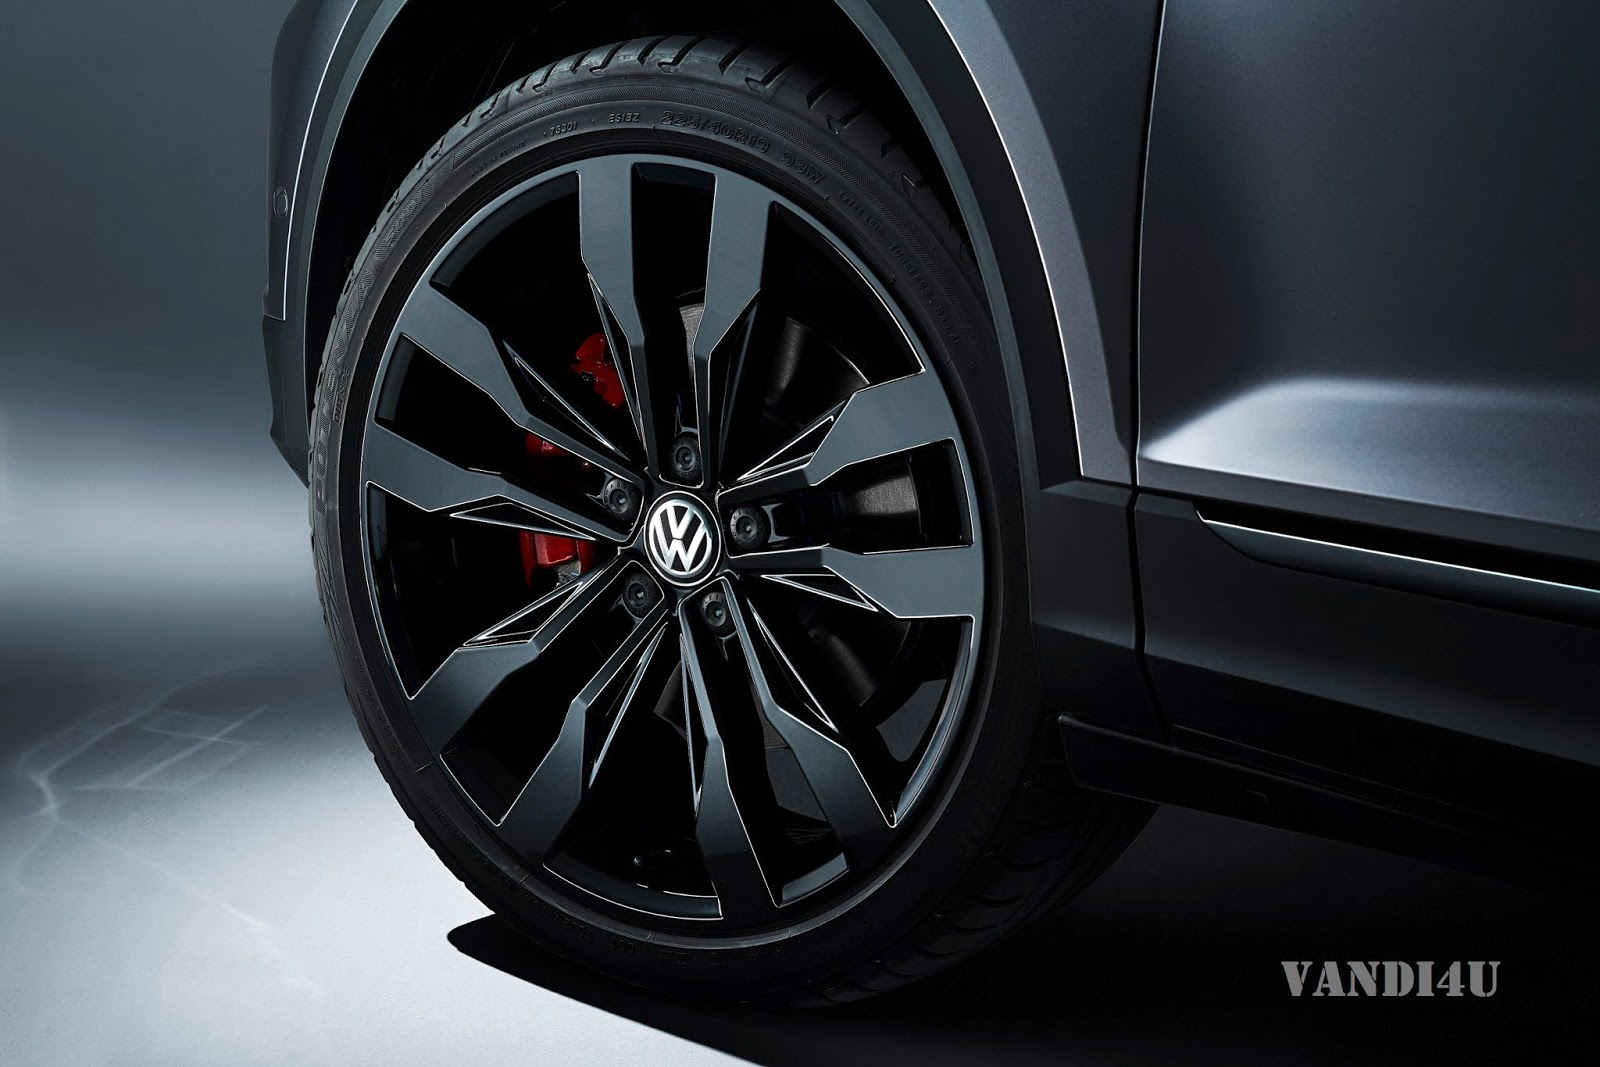 Volkswagen T-Roc gets New Top-Of-The-Range Engine And More Customisation Options   VANDI4U